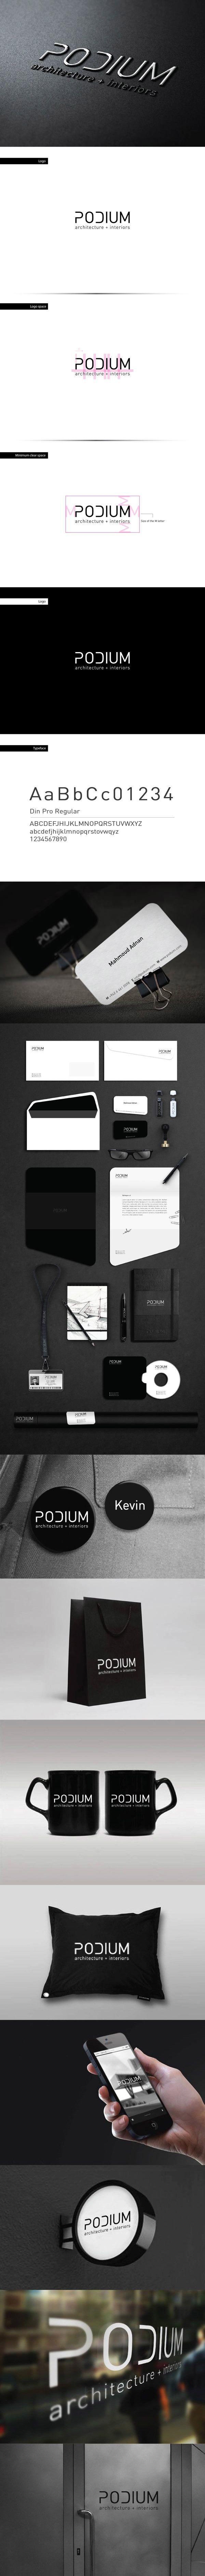 Podium by Mahmoud Alkhawaja, via Behance | #stationary #corporate #design #corporatedesign #identity #branding #marketing < repinned by www.BlickeDeeler.de | Take a look at www.LogoGestaltung-Hamburg.de